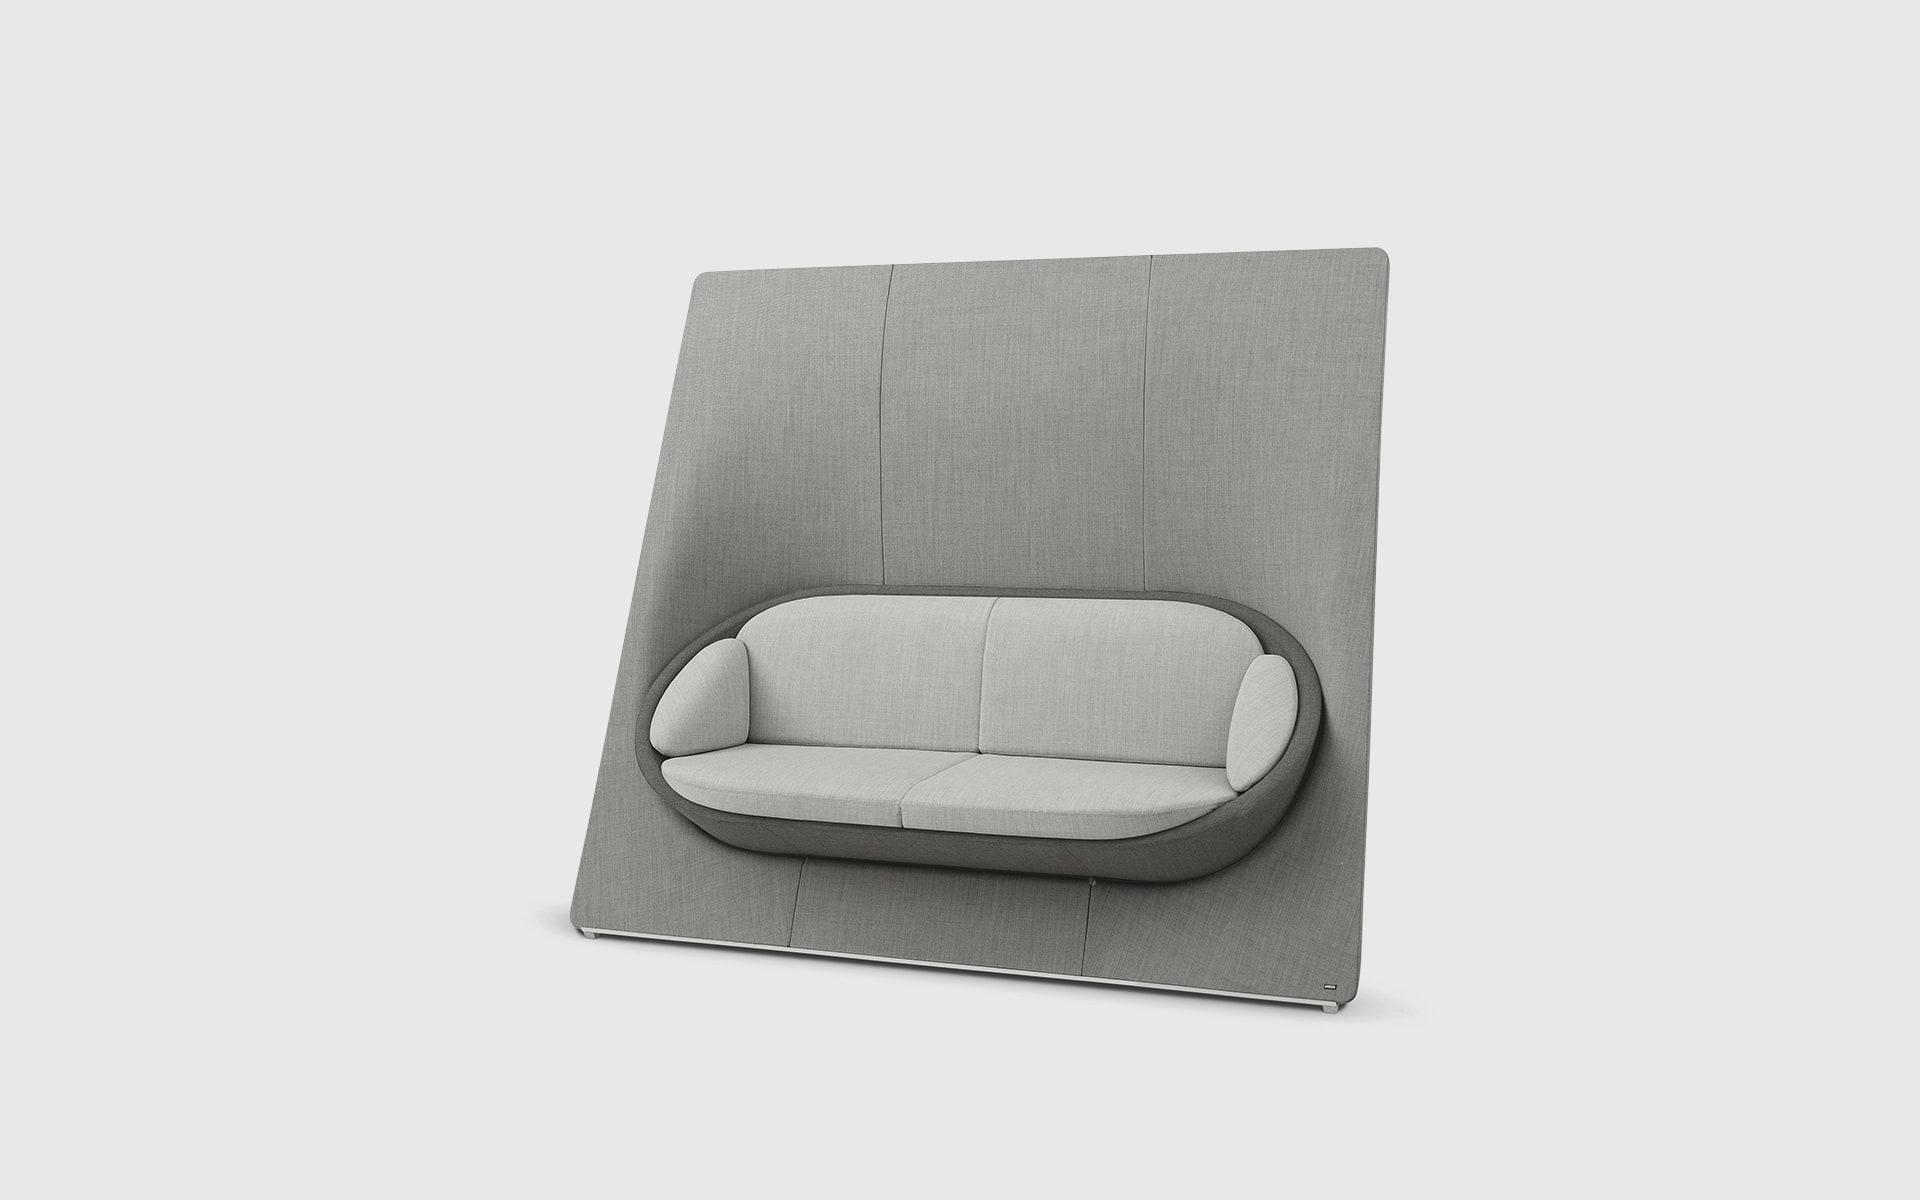 Profim Wyspa Lounge Sitzsystem von ITO Design in altrosa und grau